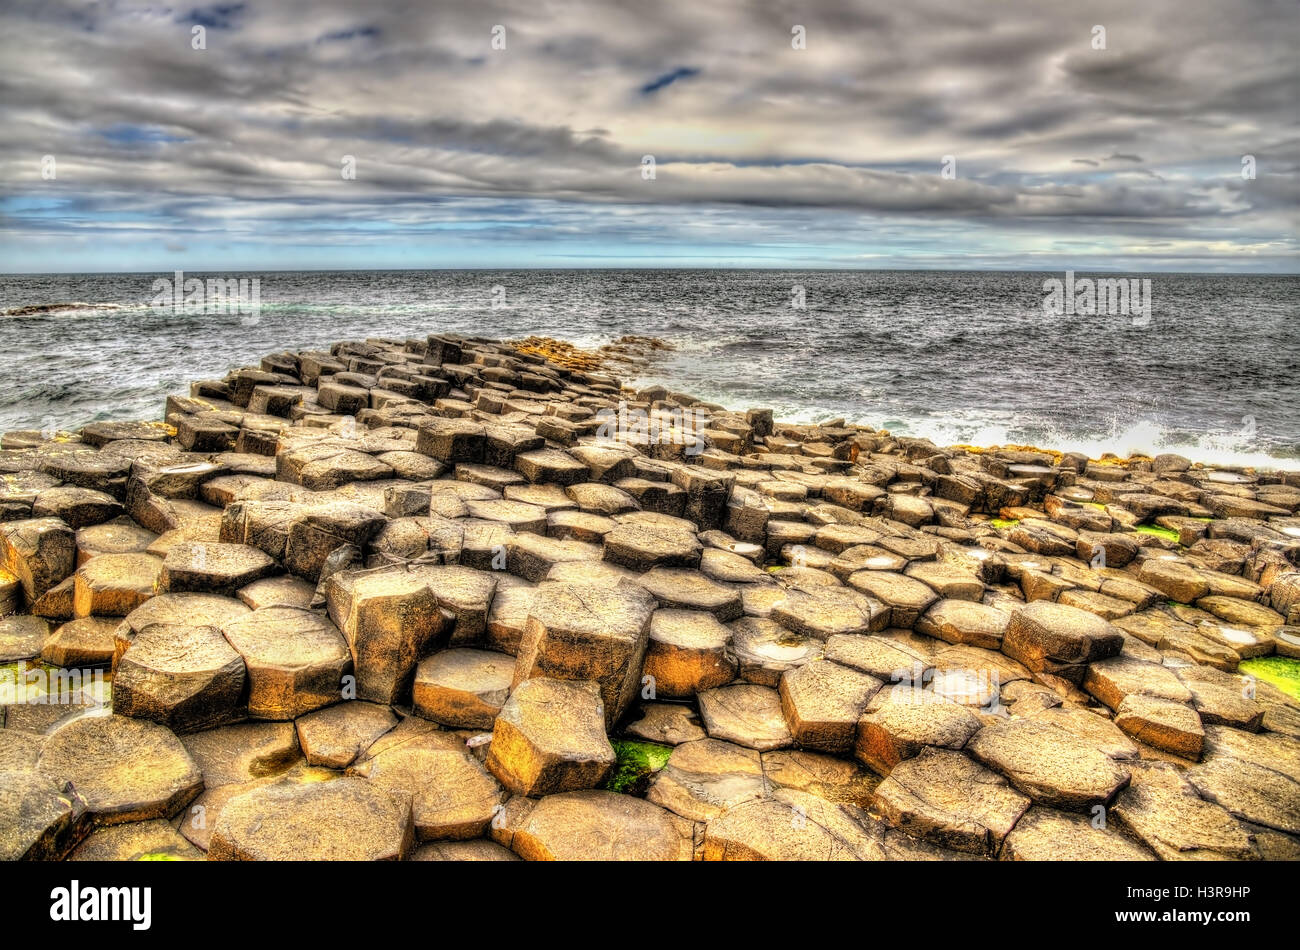 Basalt-tiled seashore of the Giant's Causeway - Northern Ireland - Stock Image